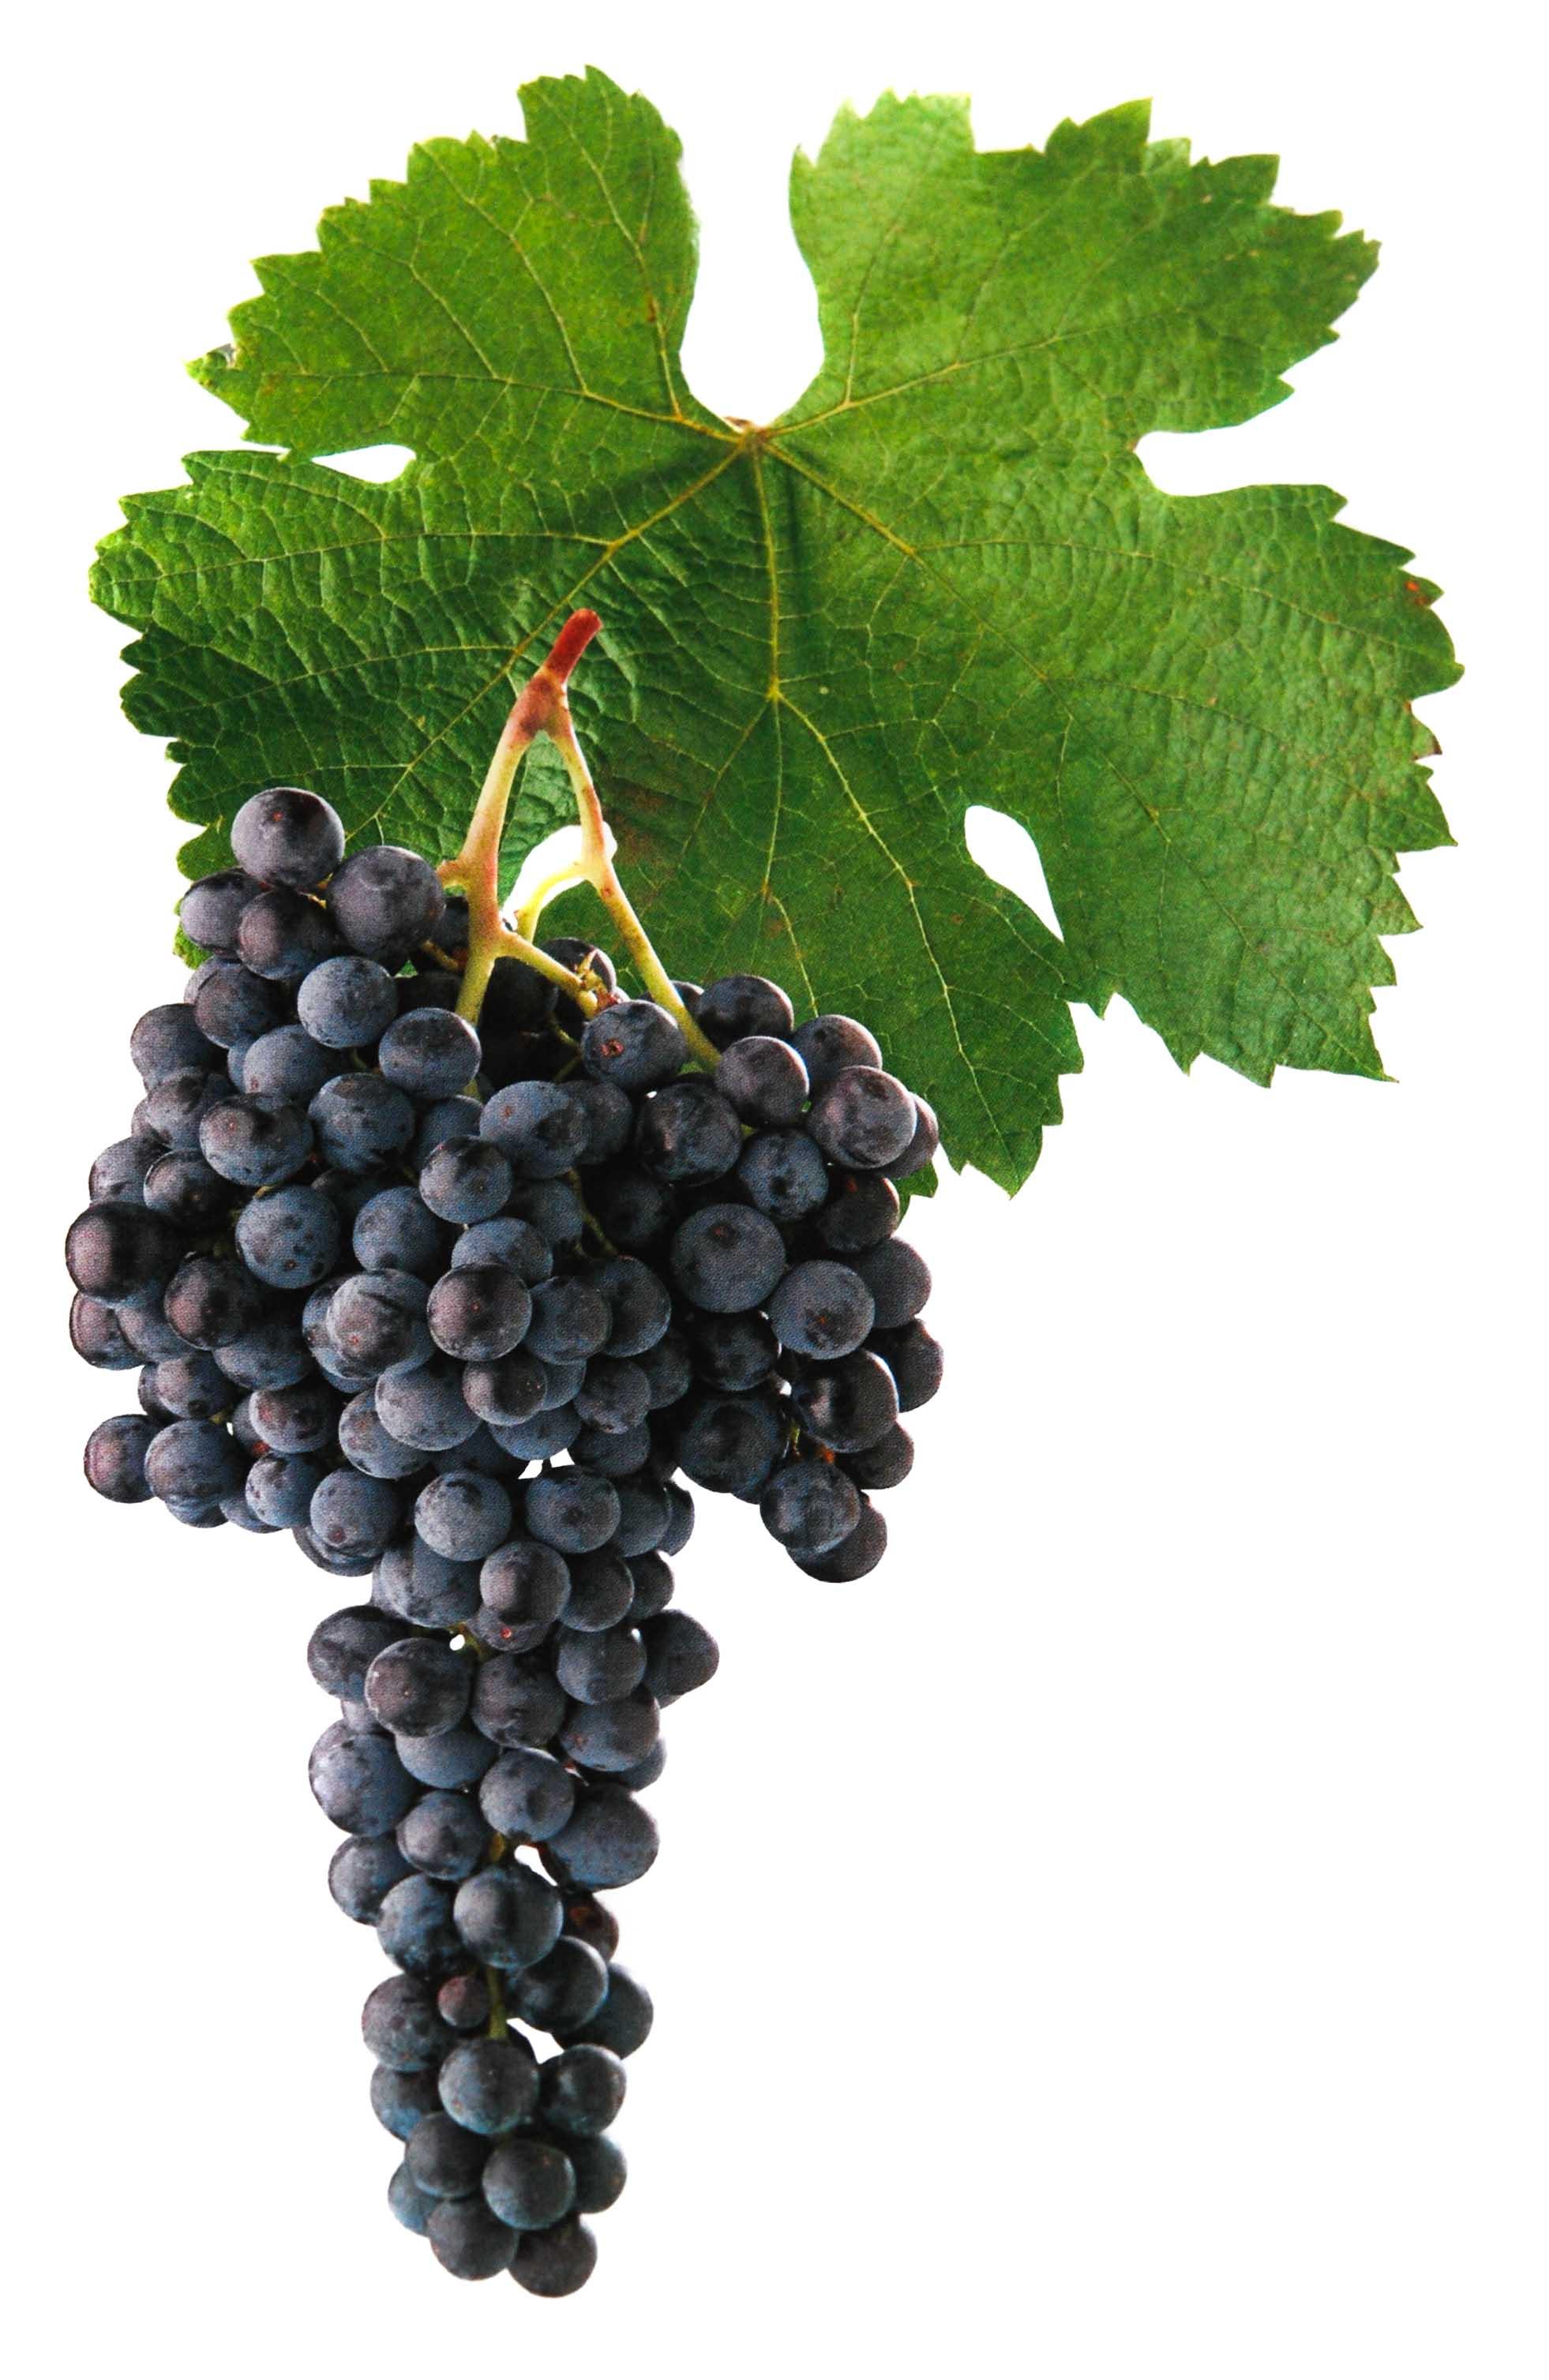 Merlot víno hrozen a list